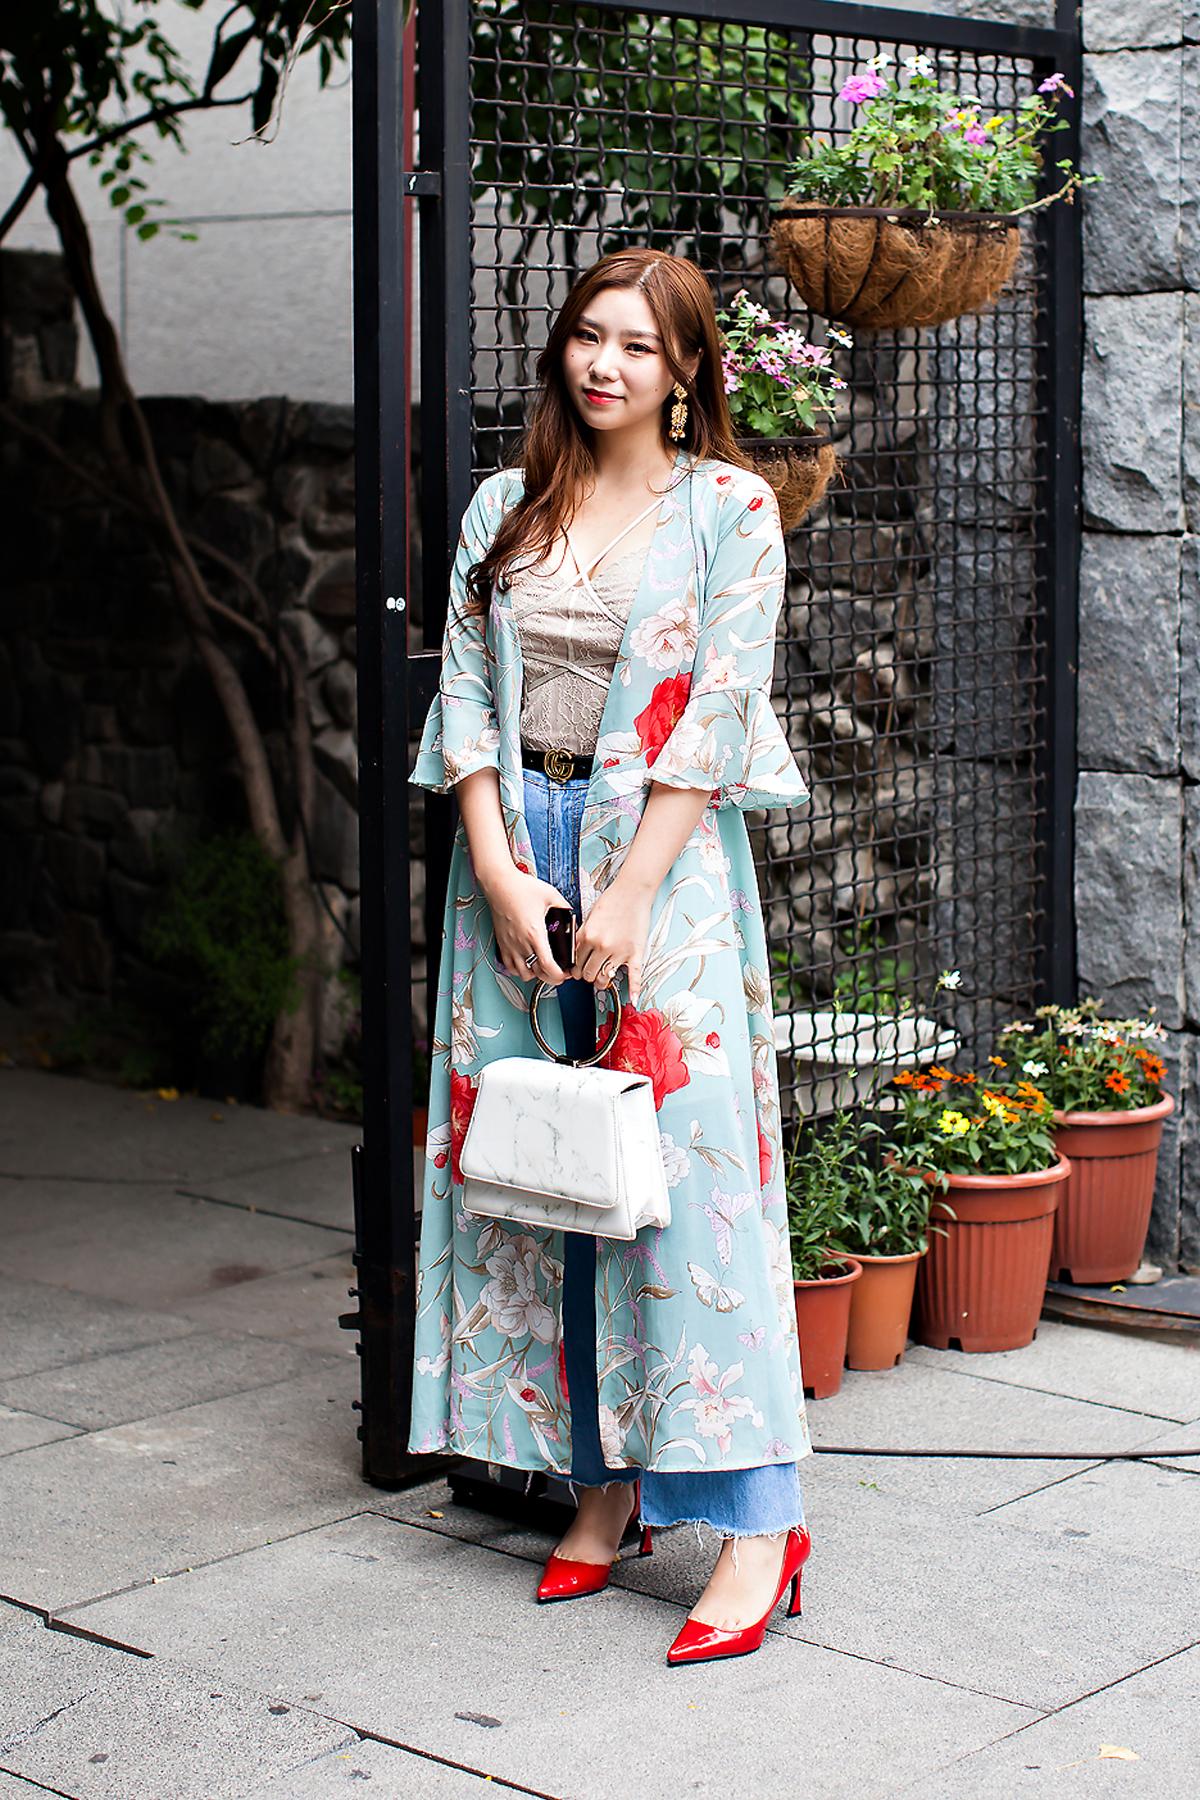 Ryang Woomoon, Street Fashion 2017 in Seoul.jpg